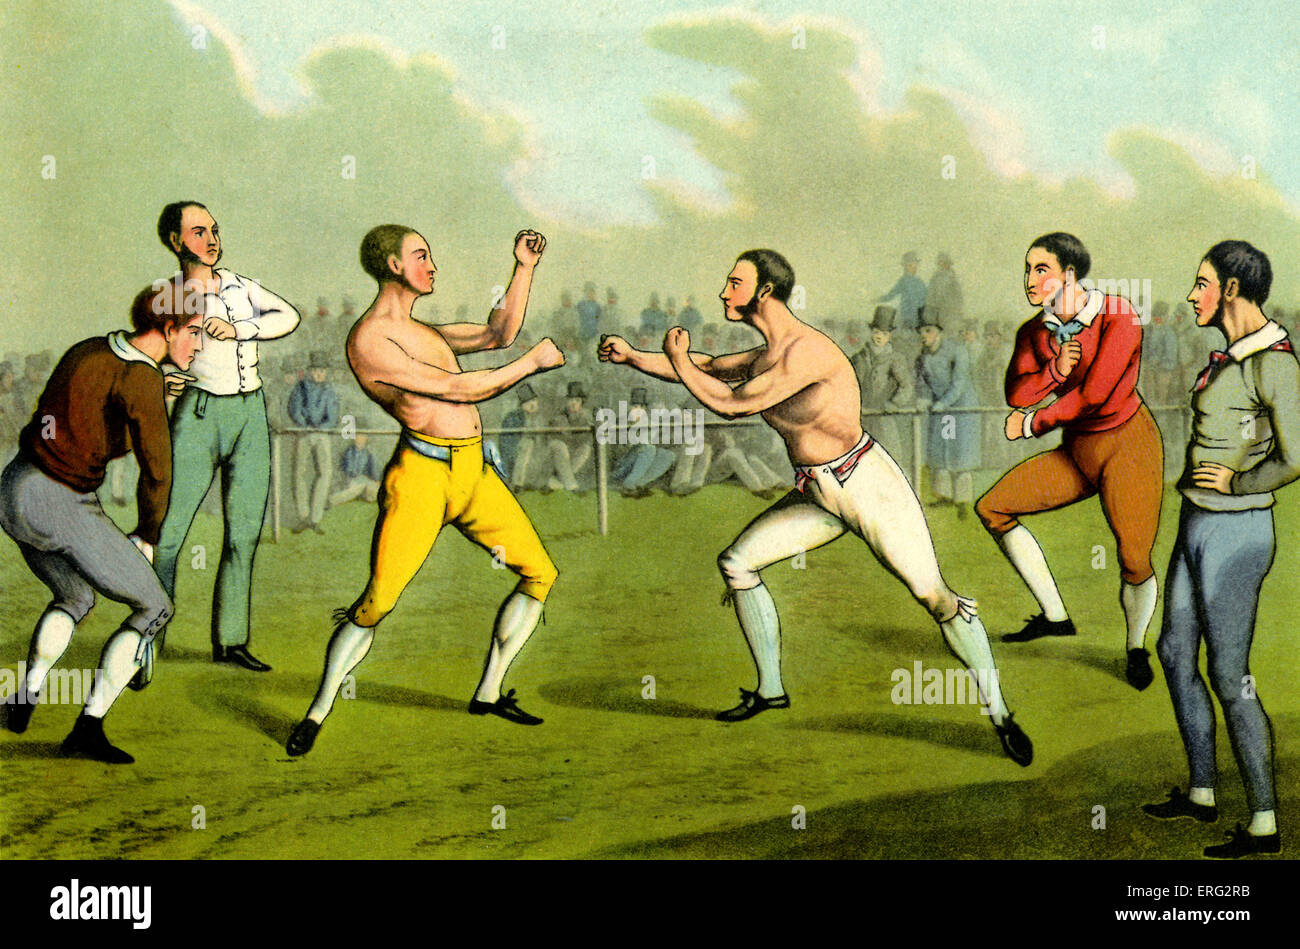 Bare-knuckle boxing.  Engraving by Henry Alken British artist 12 October 1785 - 7 April 1851. - Stock Image